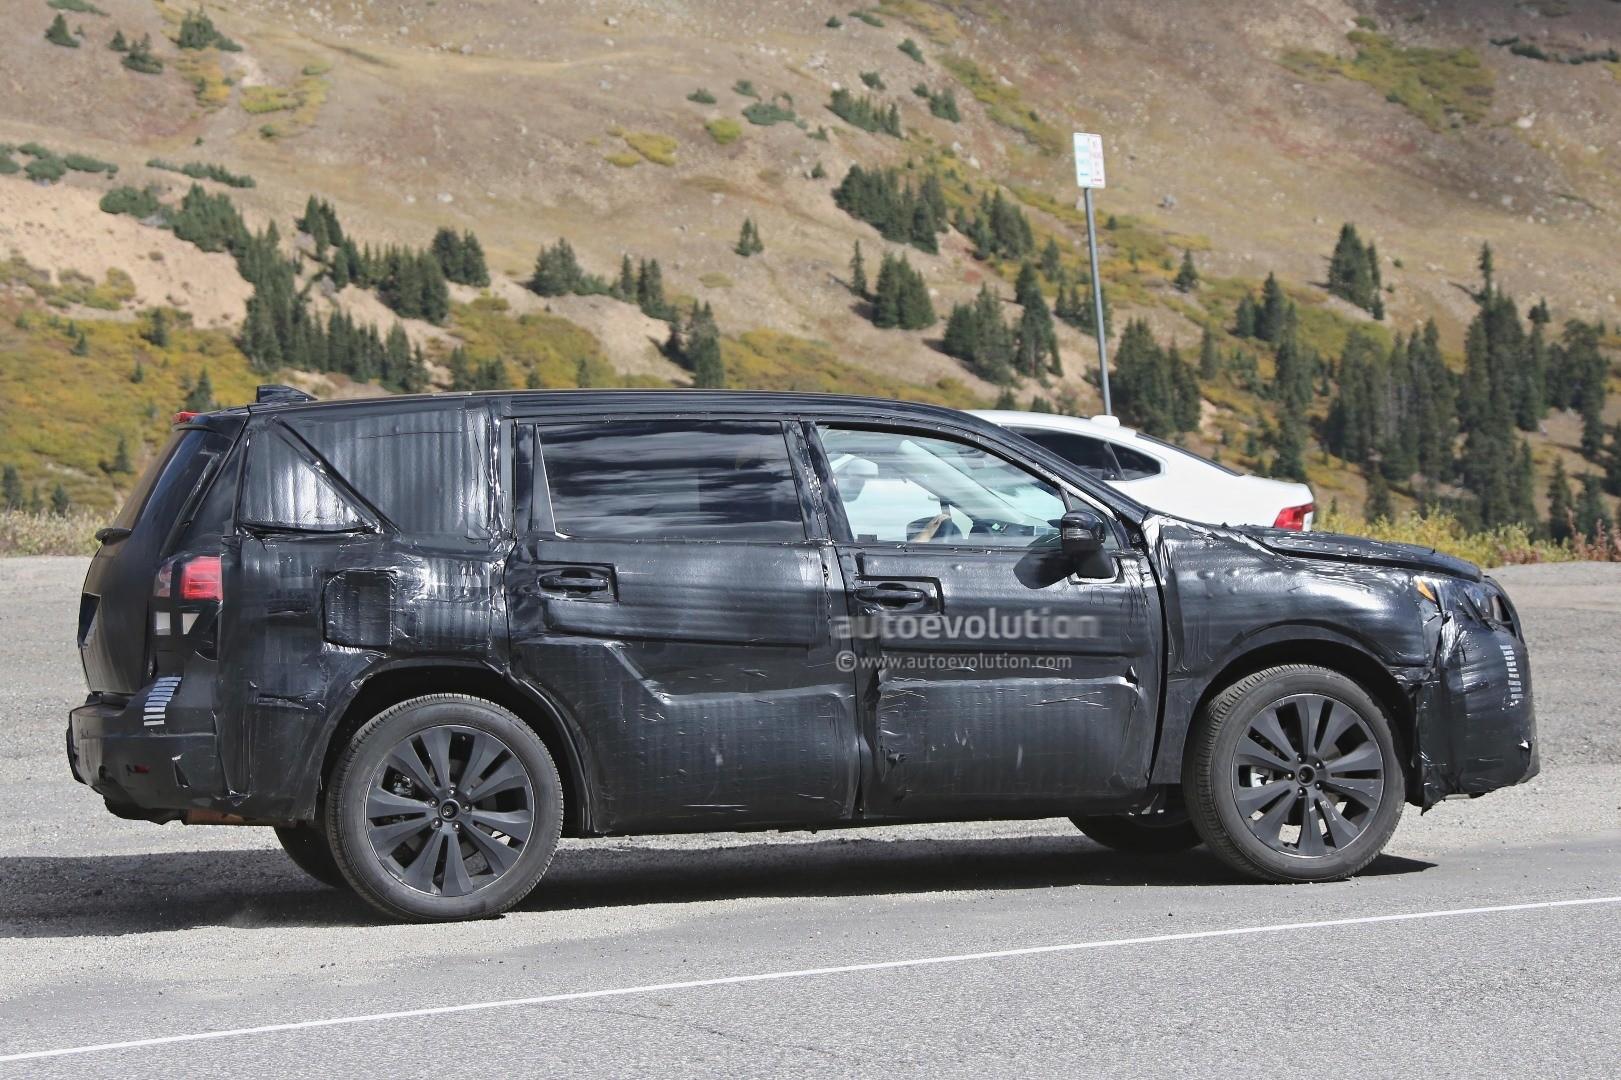 2019 Subaru Tribeca Mid Size 7 Seat Suv Previewed By Viziv